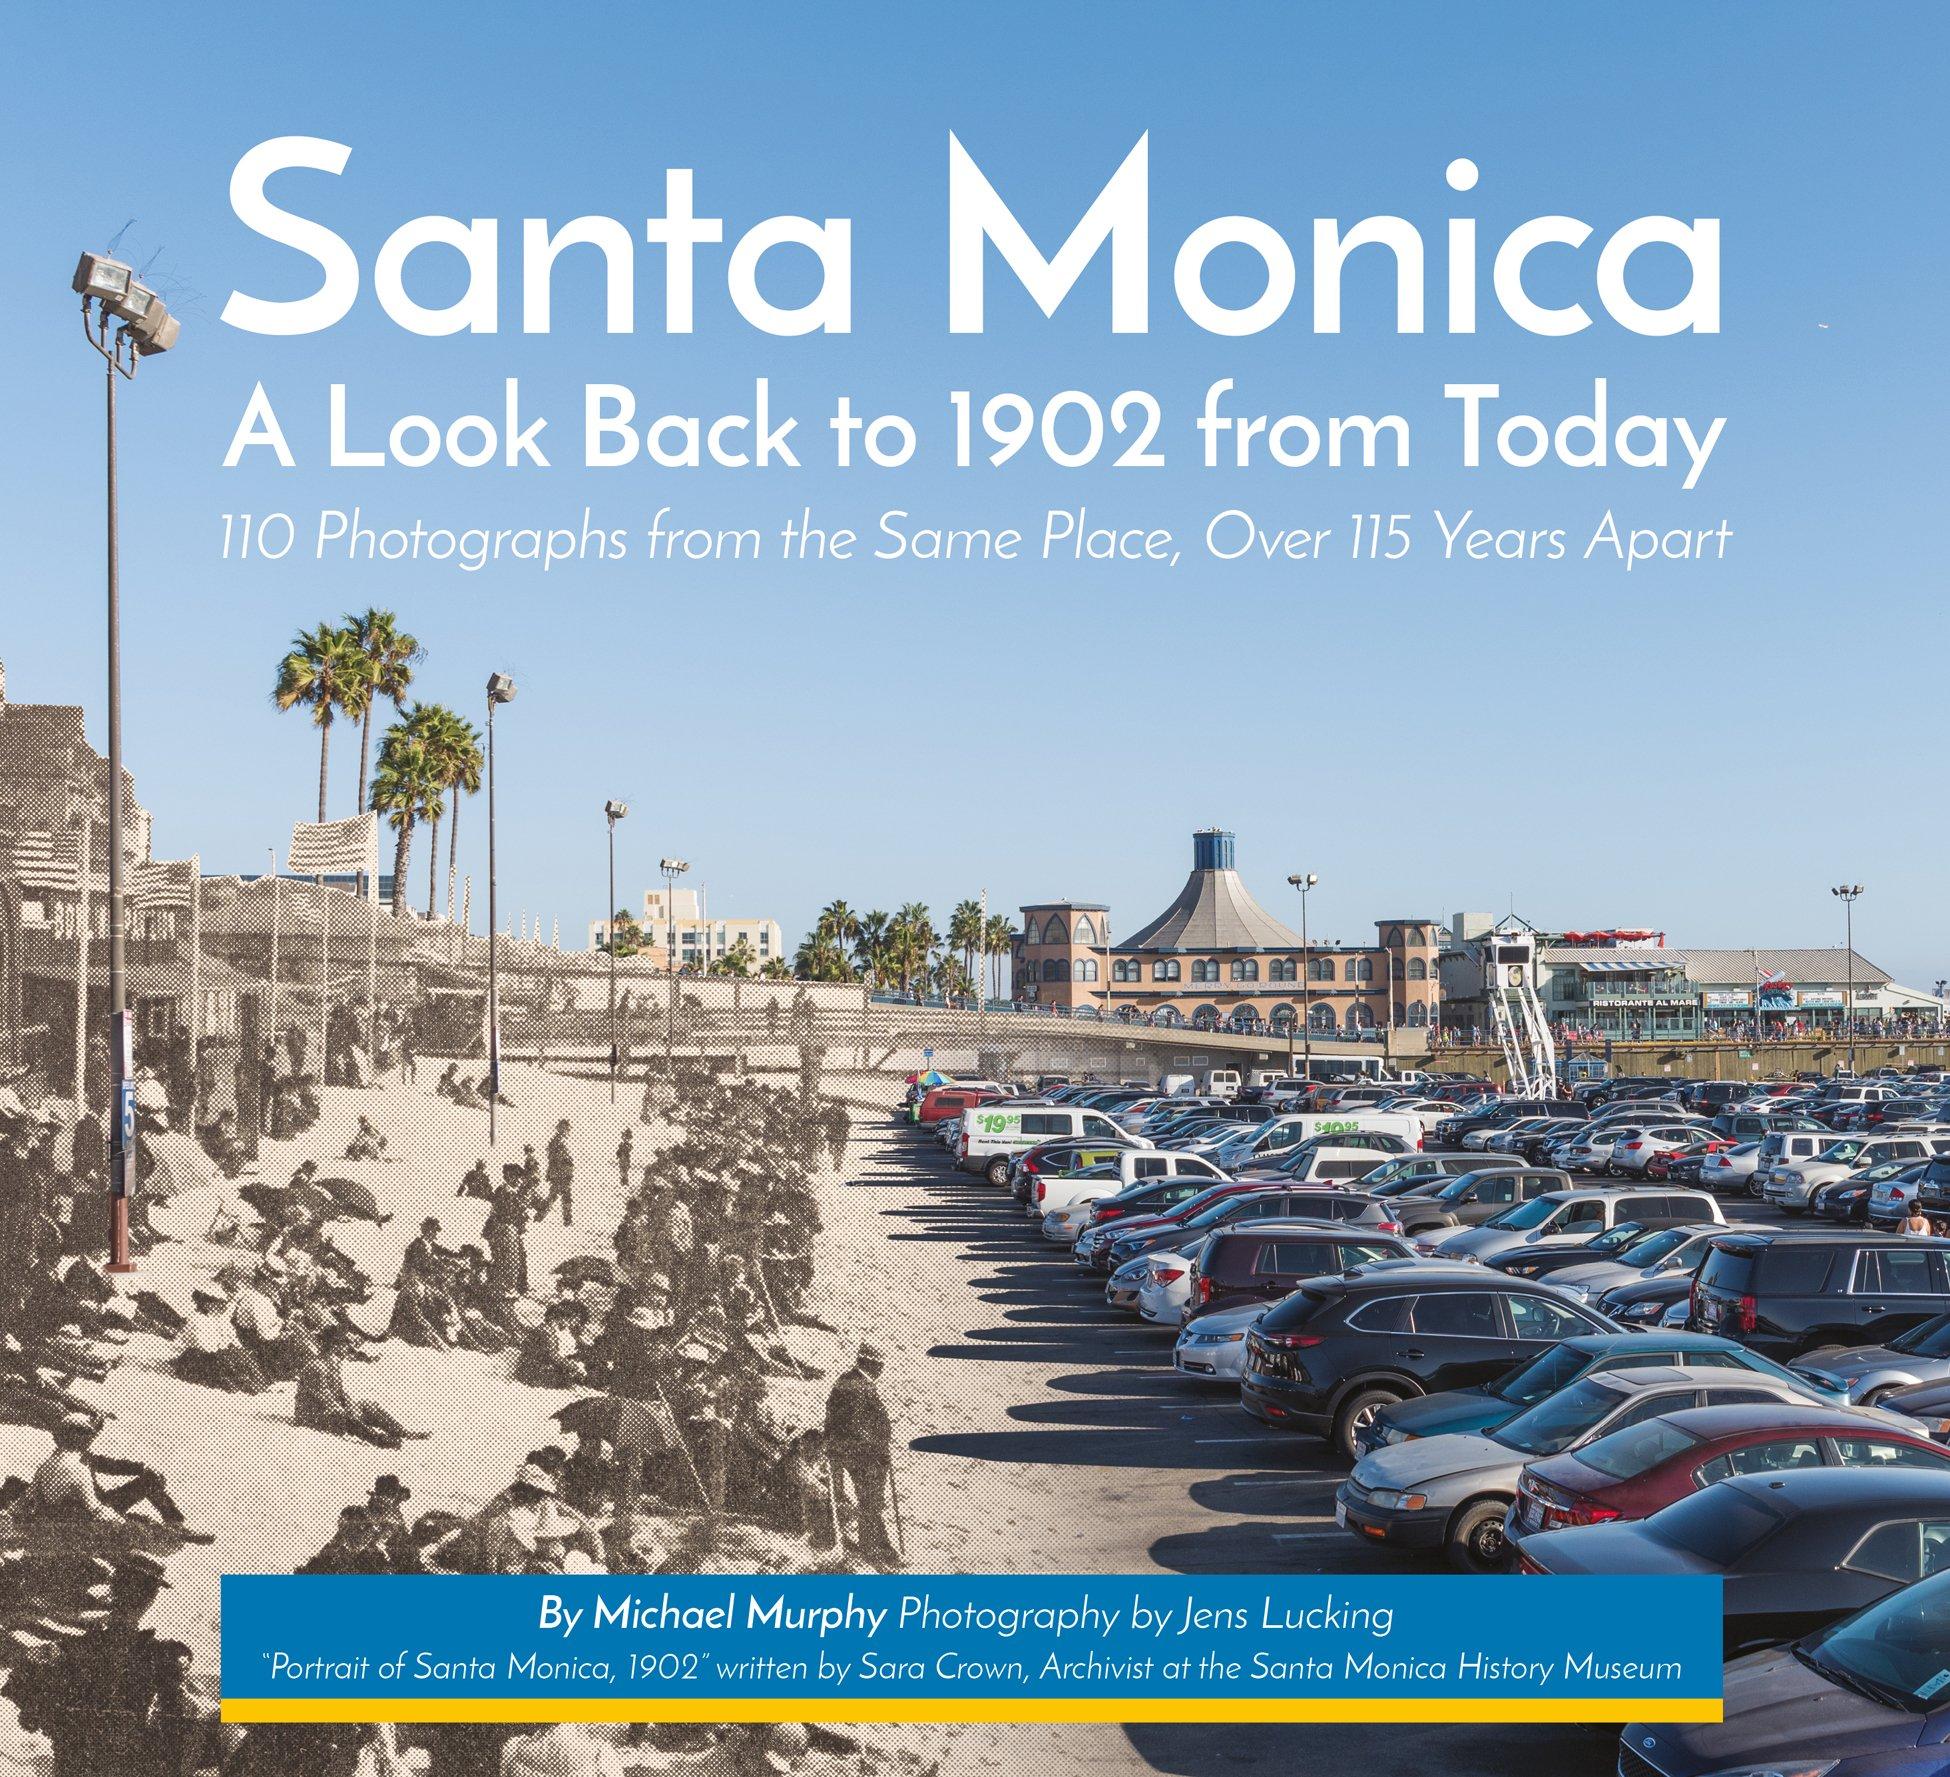 SantaMonica1902-book-cvr.jpg